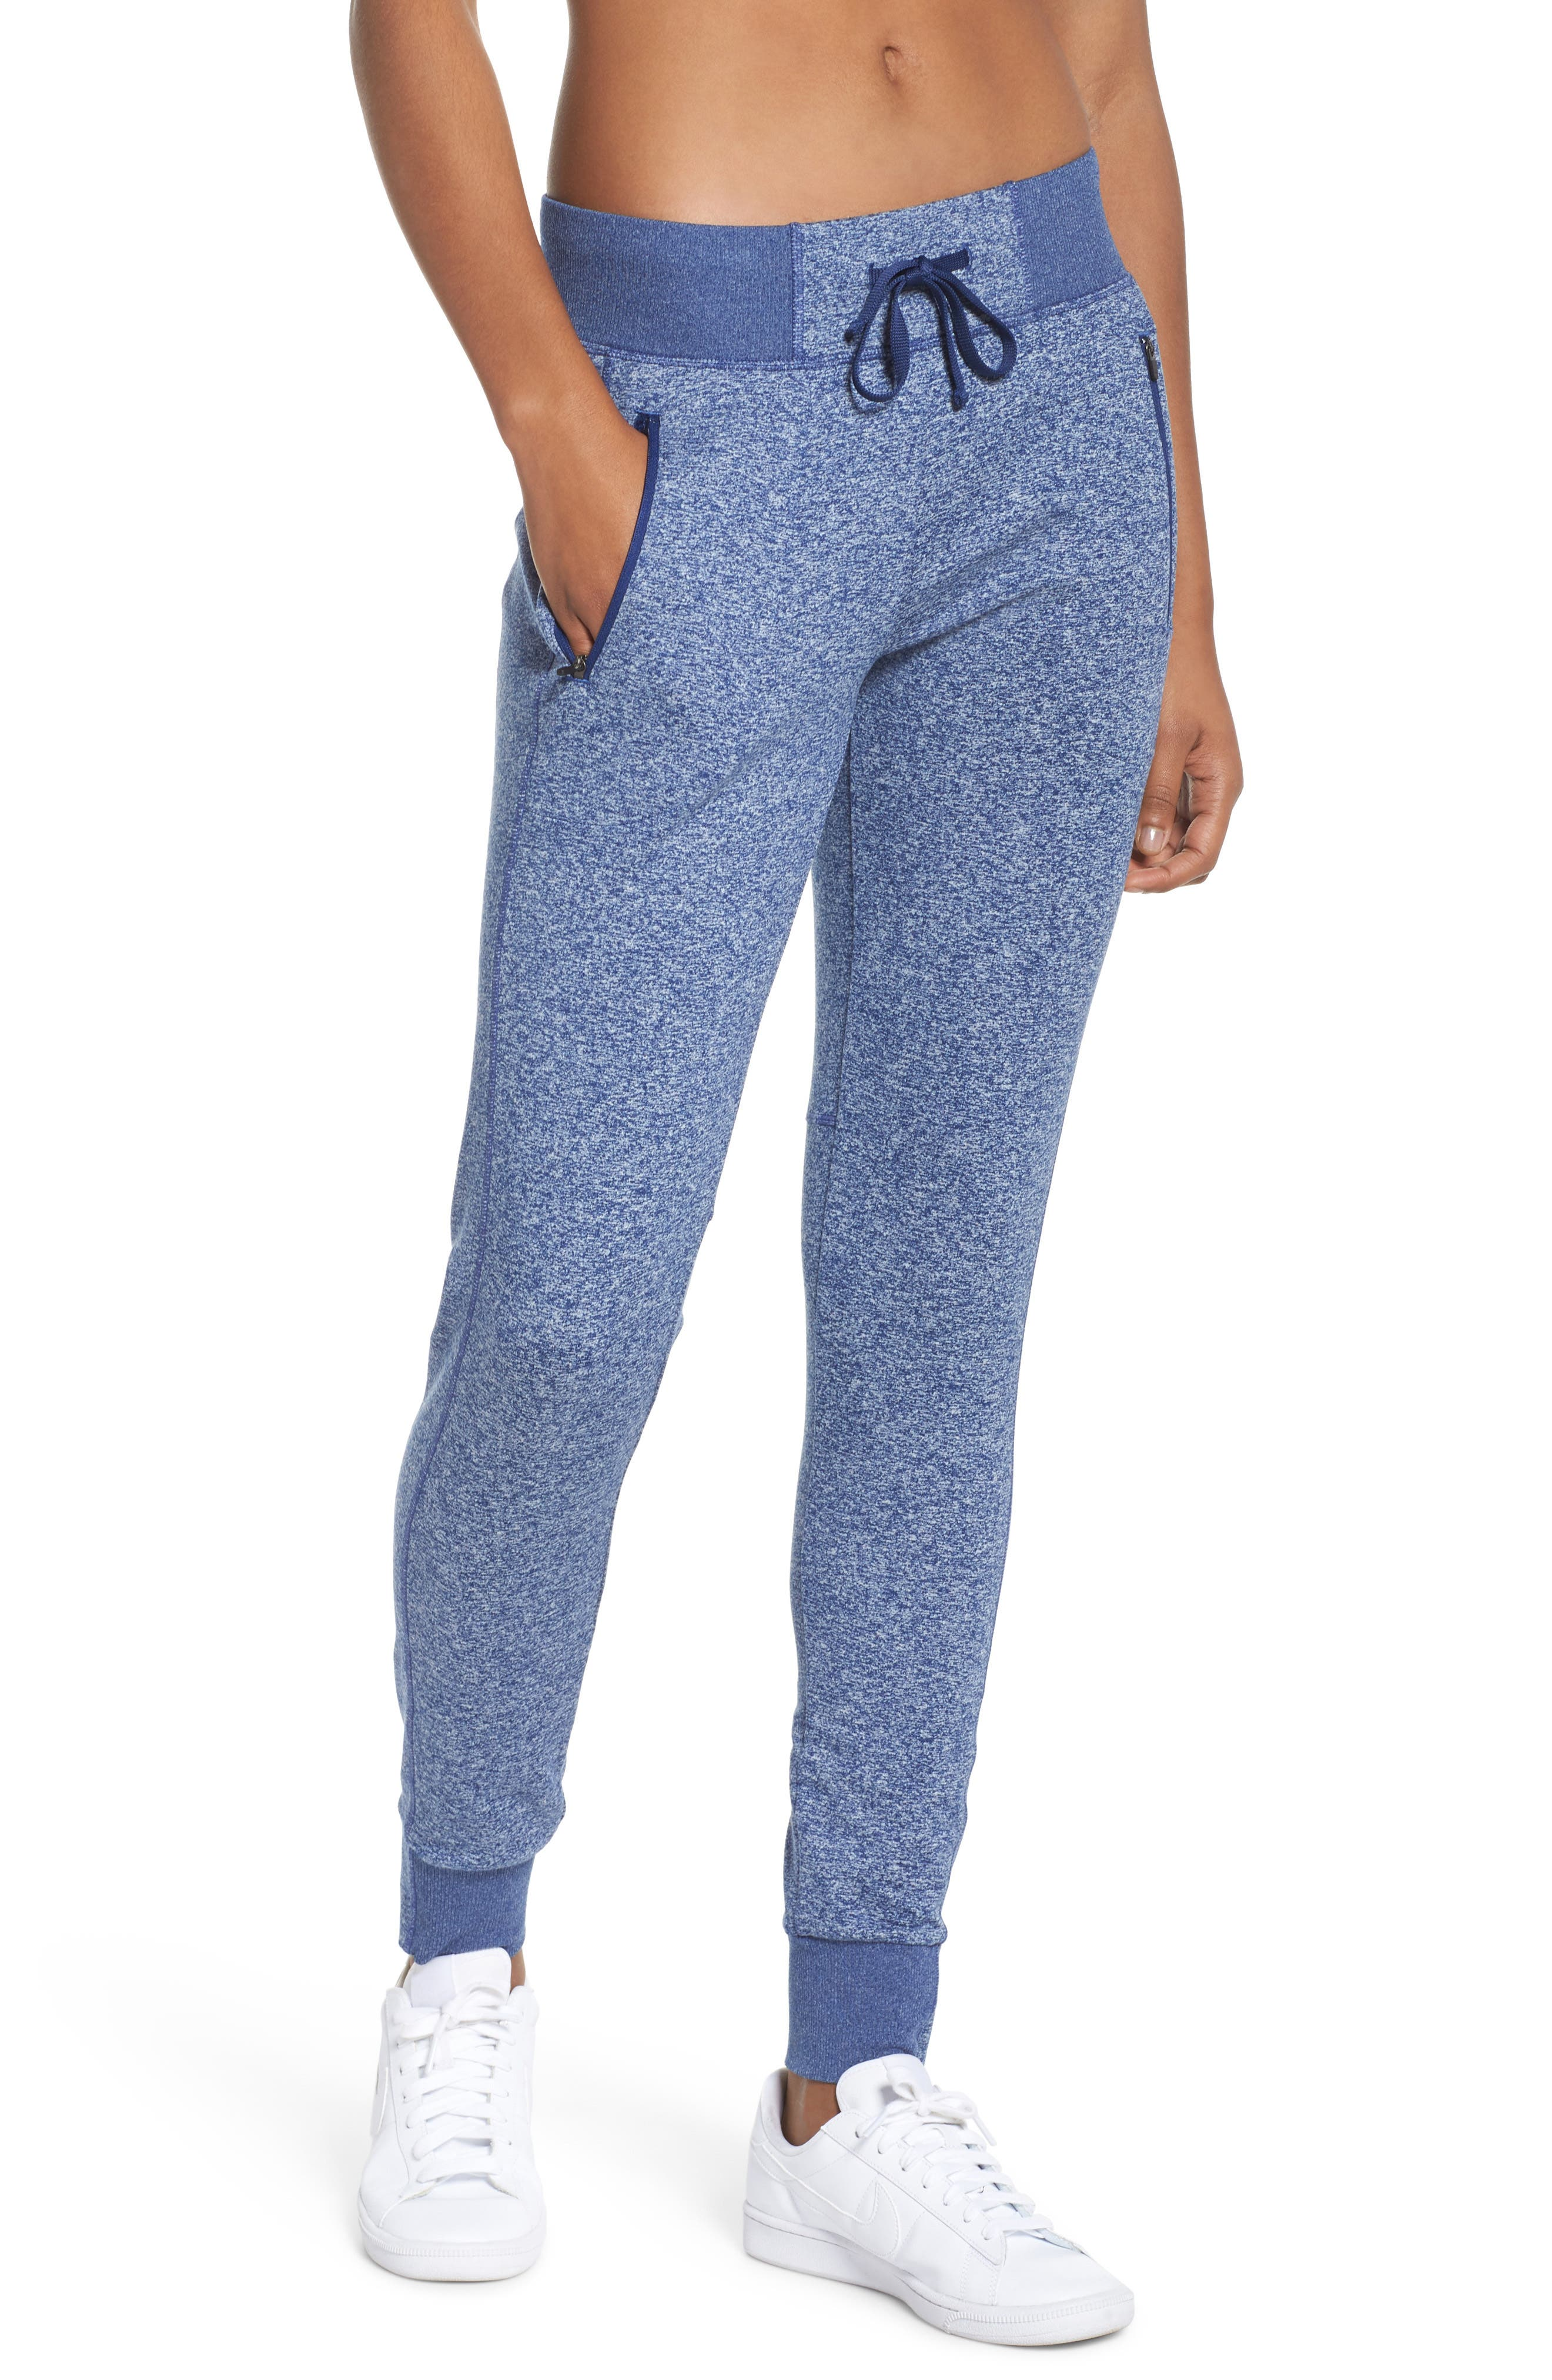 Taryn Sport Knit Pants,                             Main thumbnail 1, color,                             Blue Depths Melange